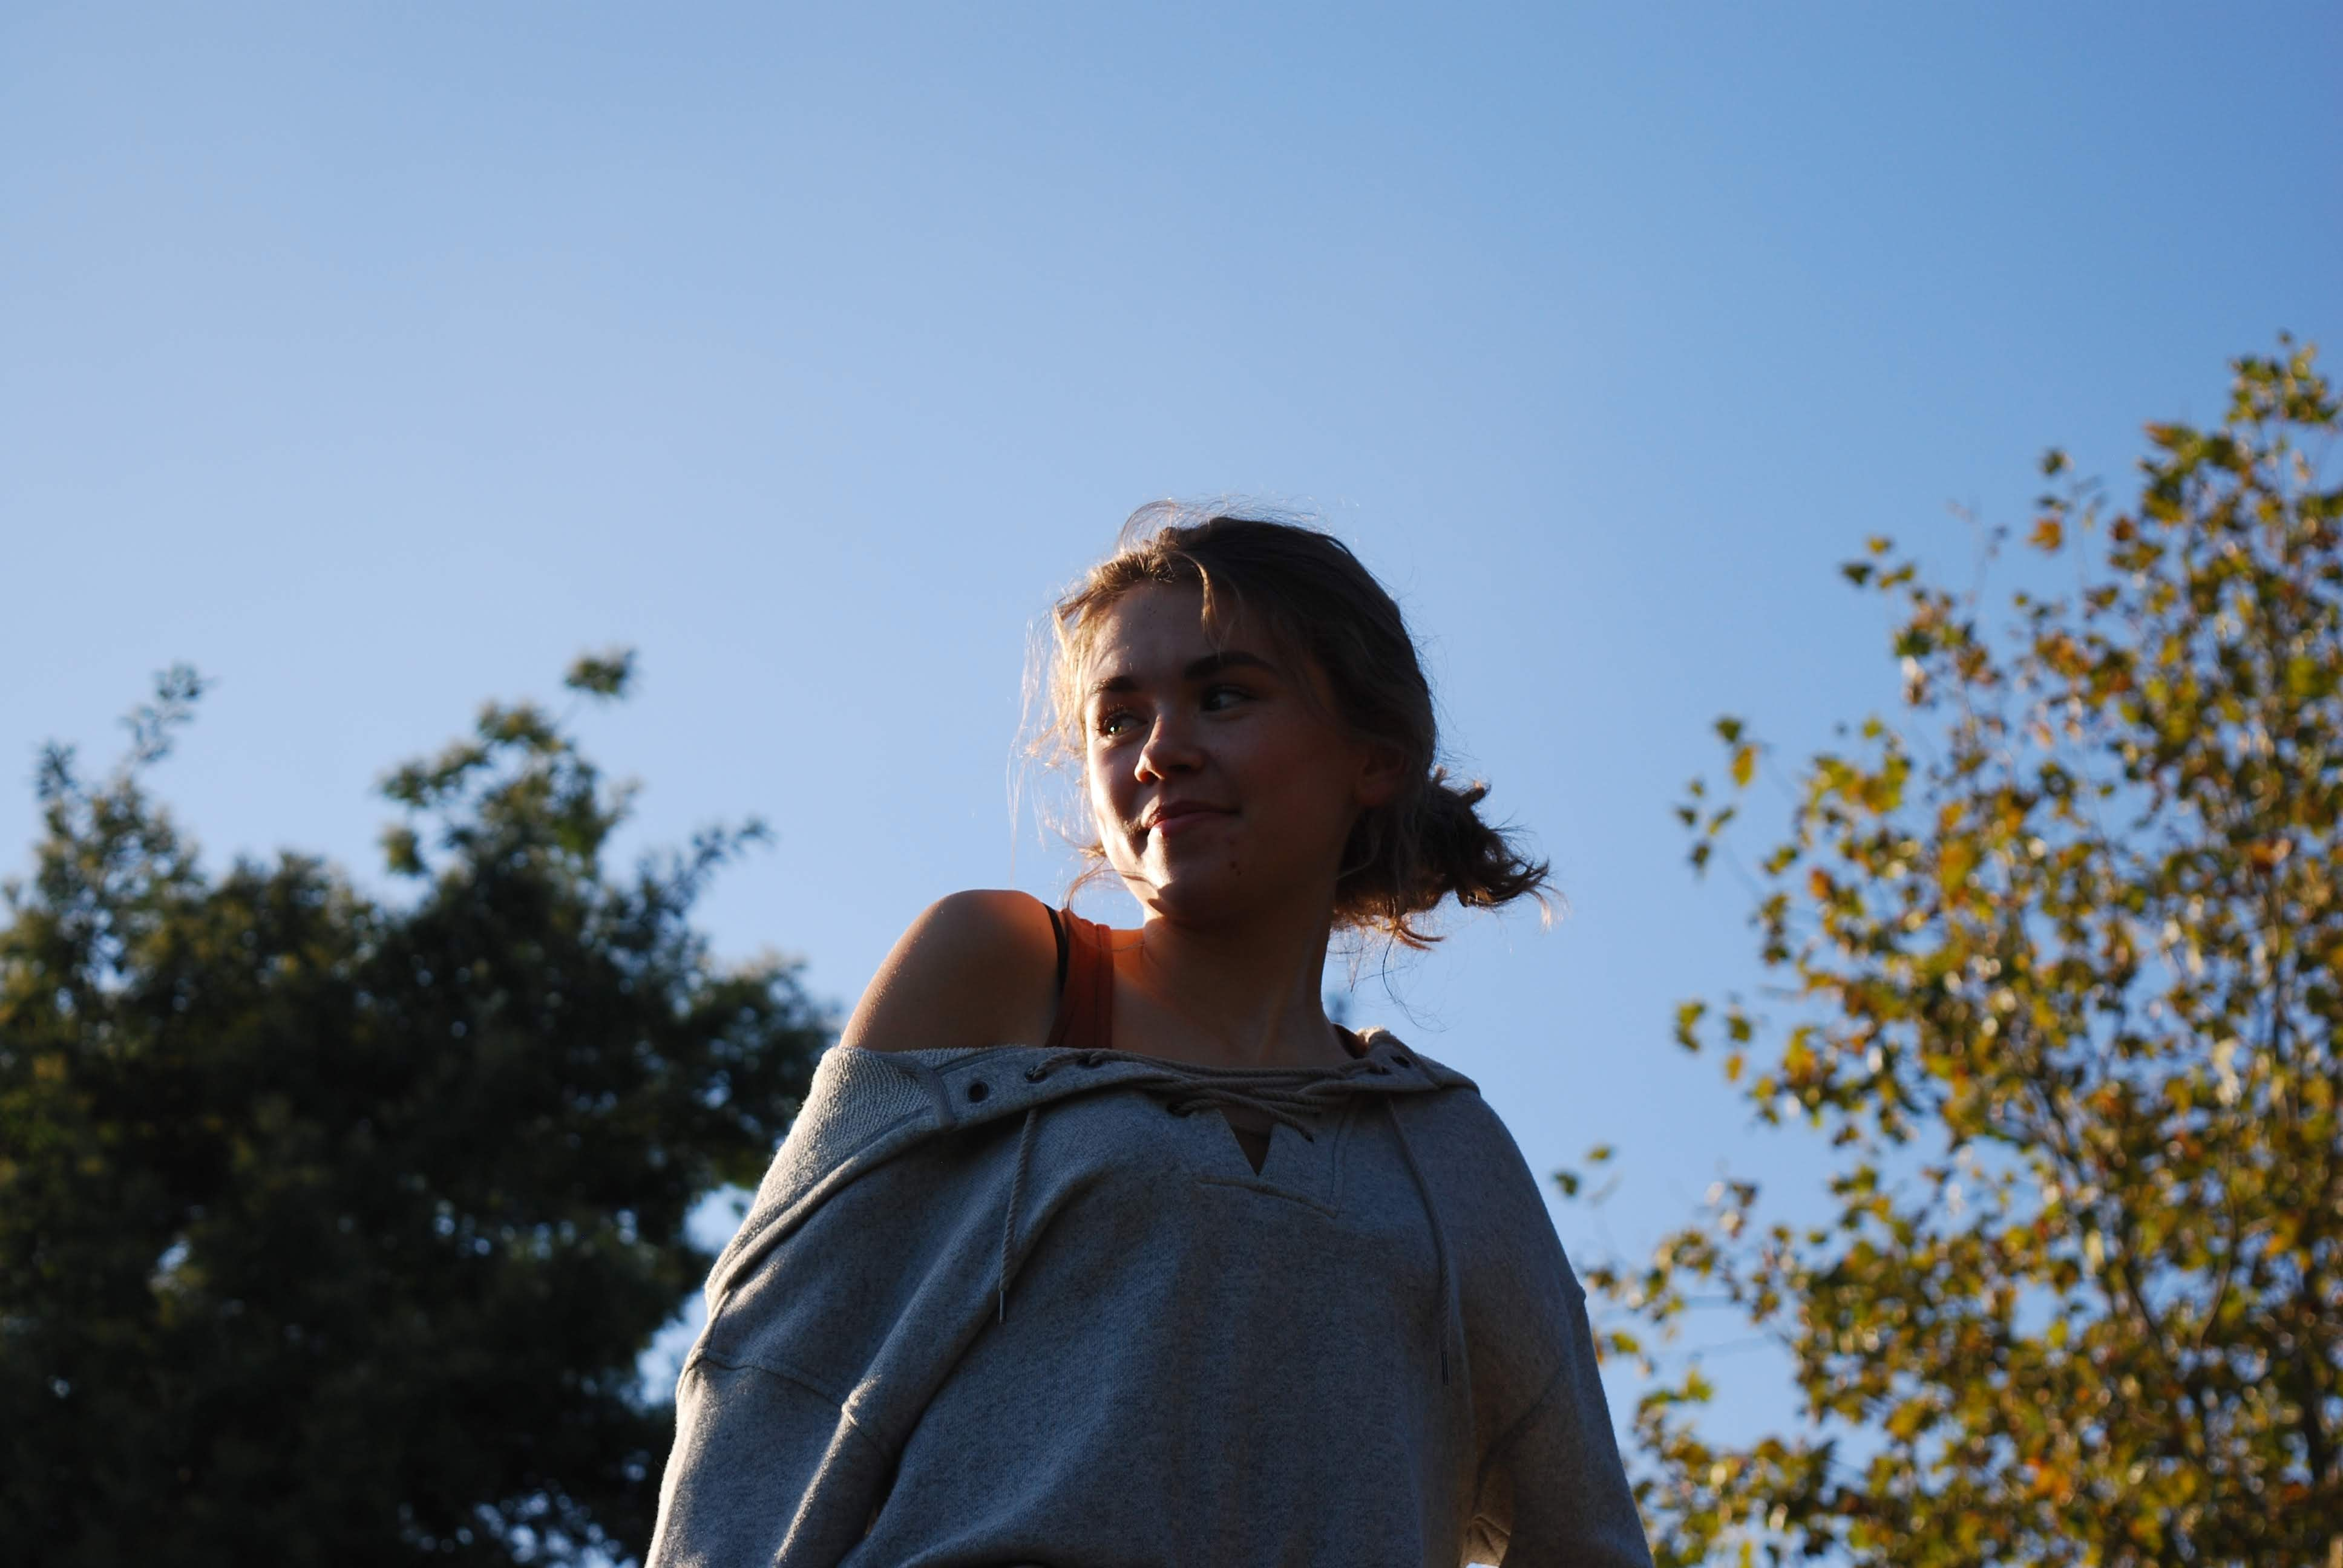 Go to Eva Wilcock's profile